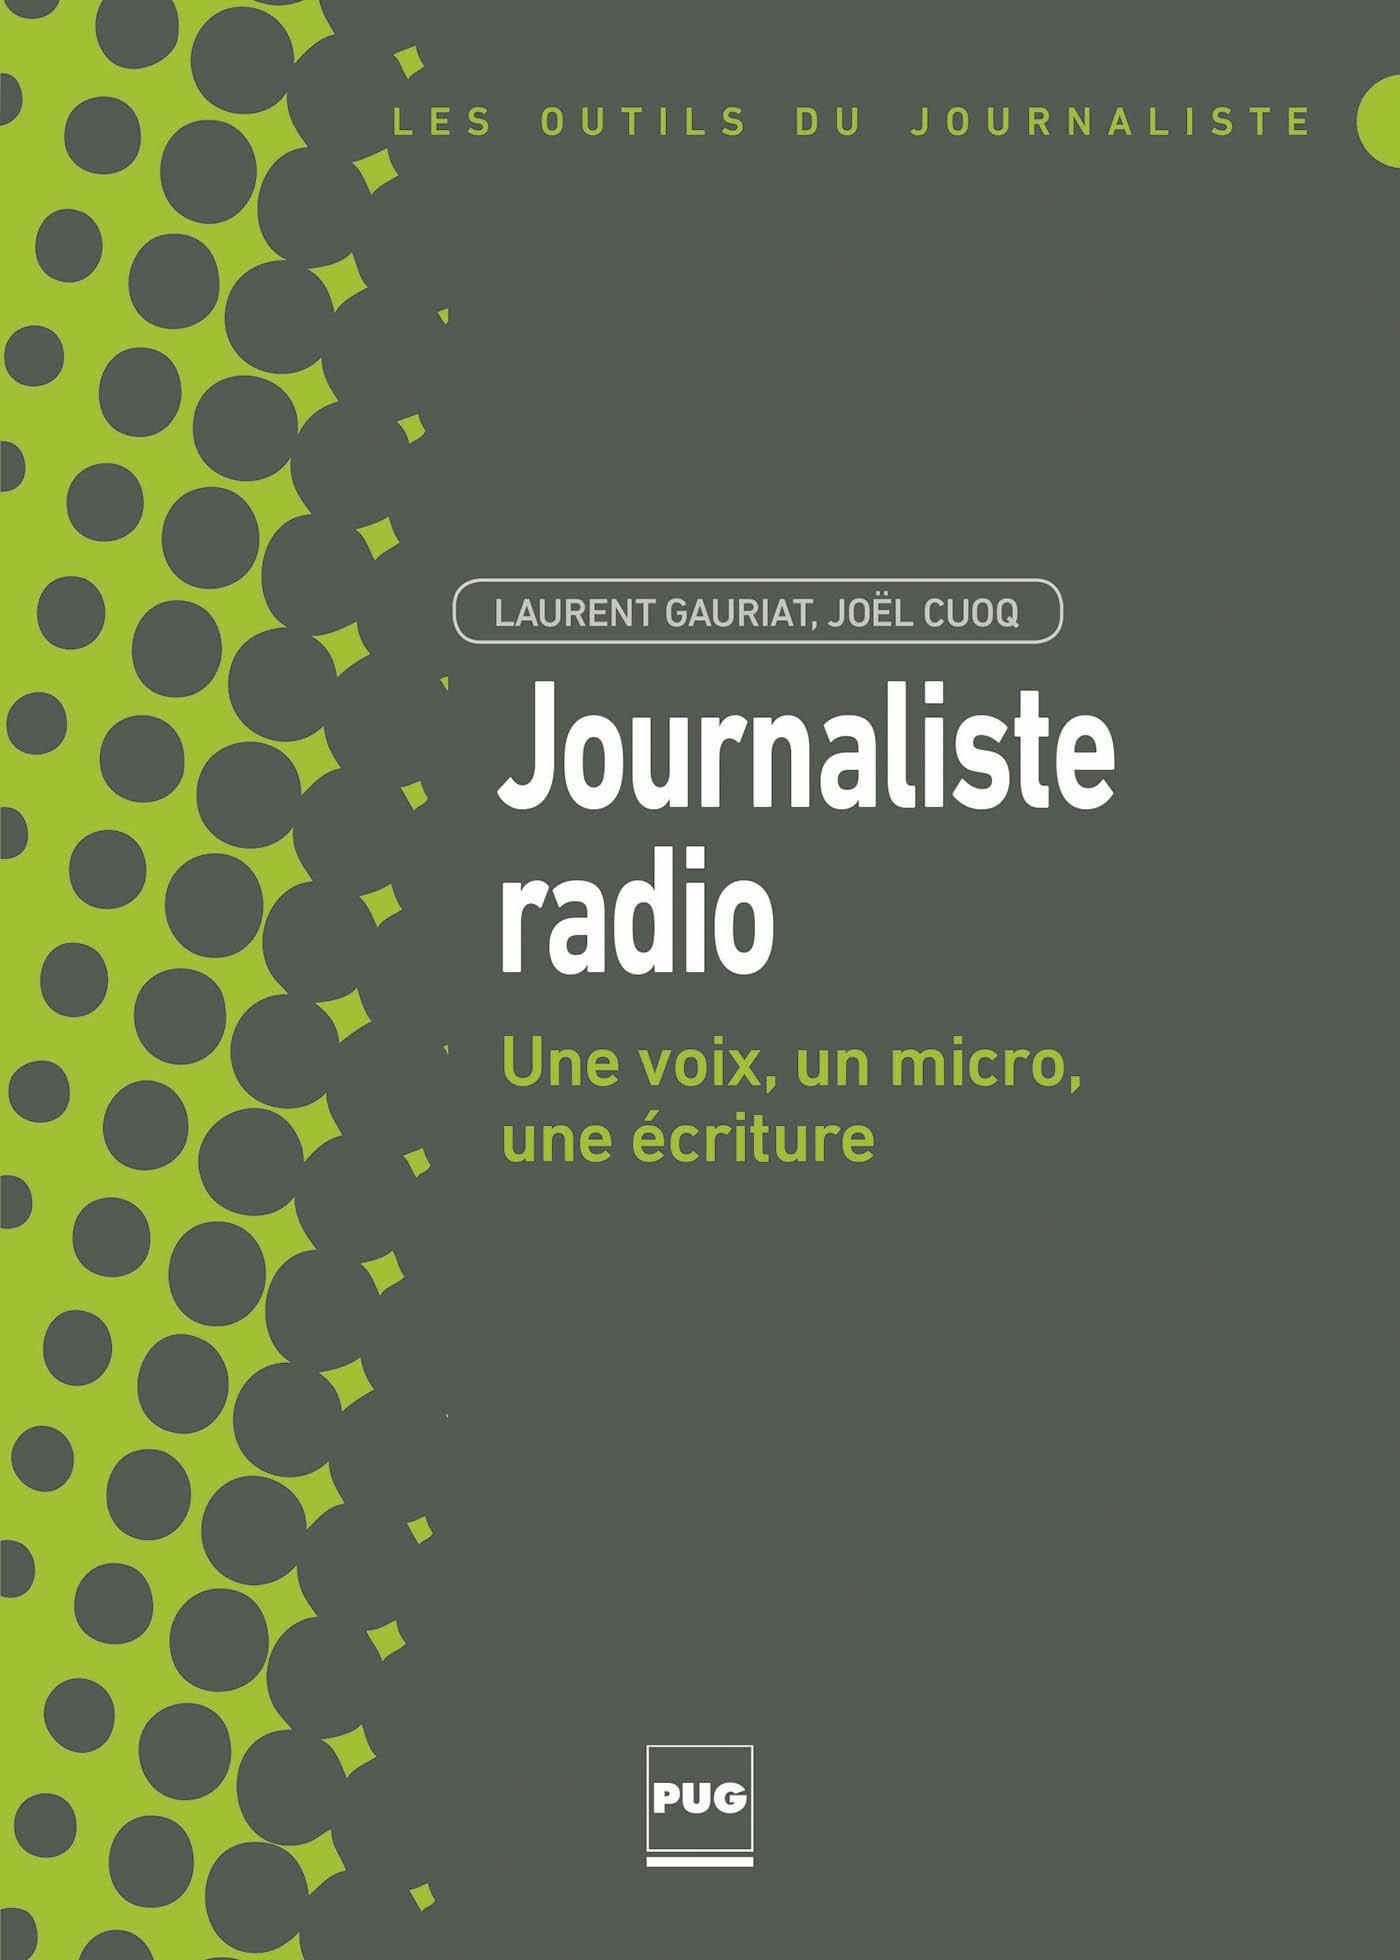 JOURNALISTE RADIO UNE VOIX, UN MICRO, UNE ECRITURE